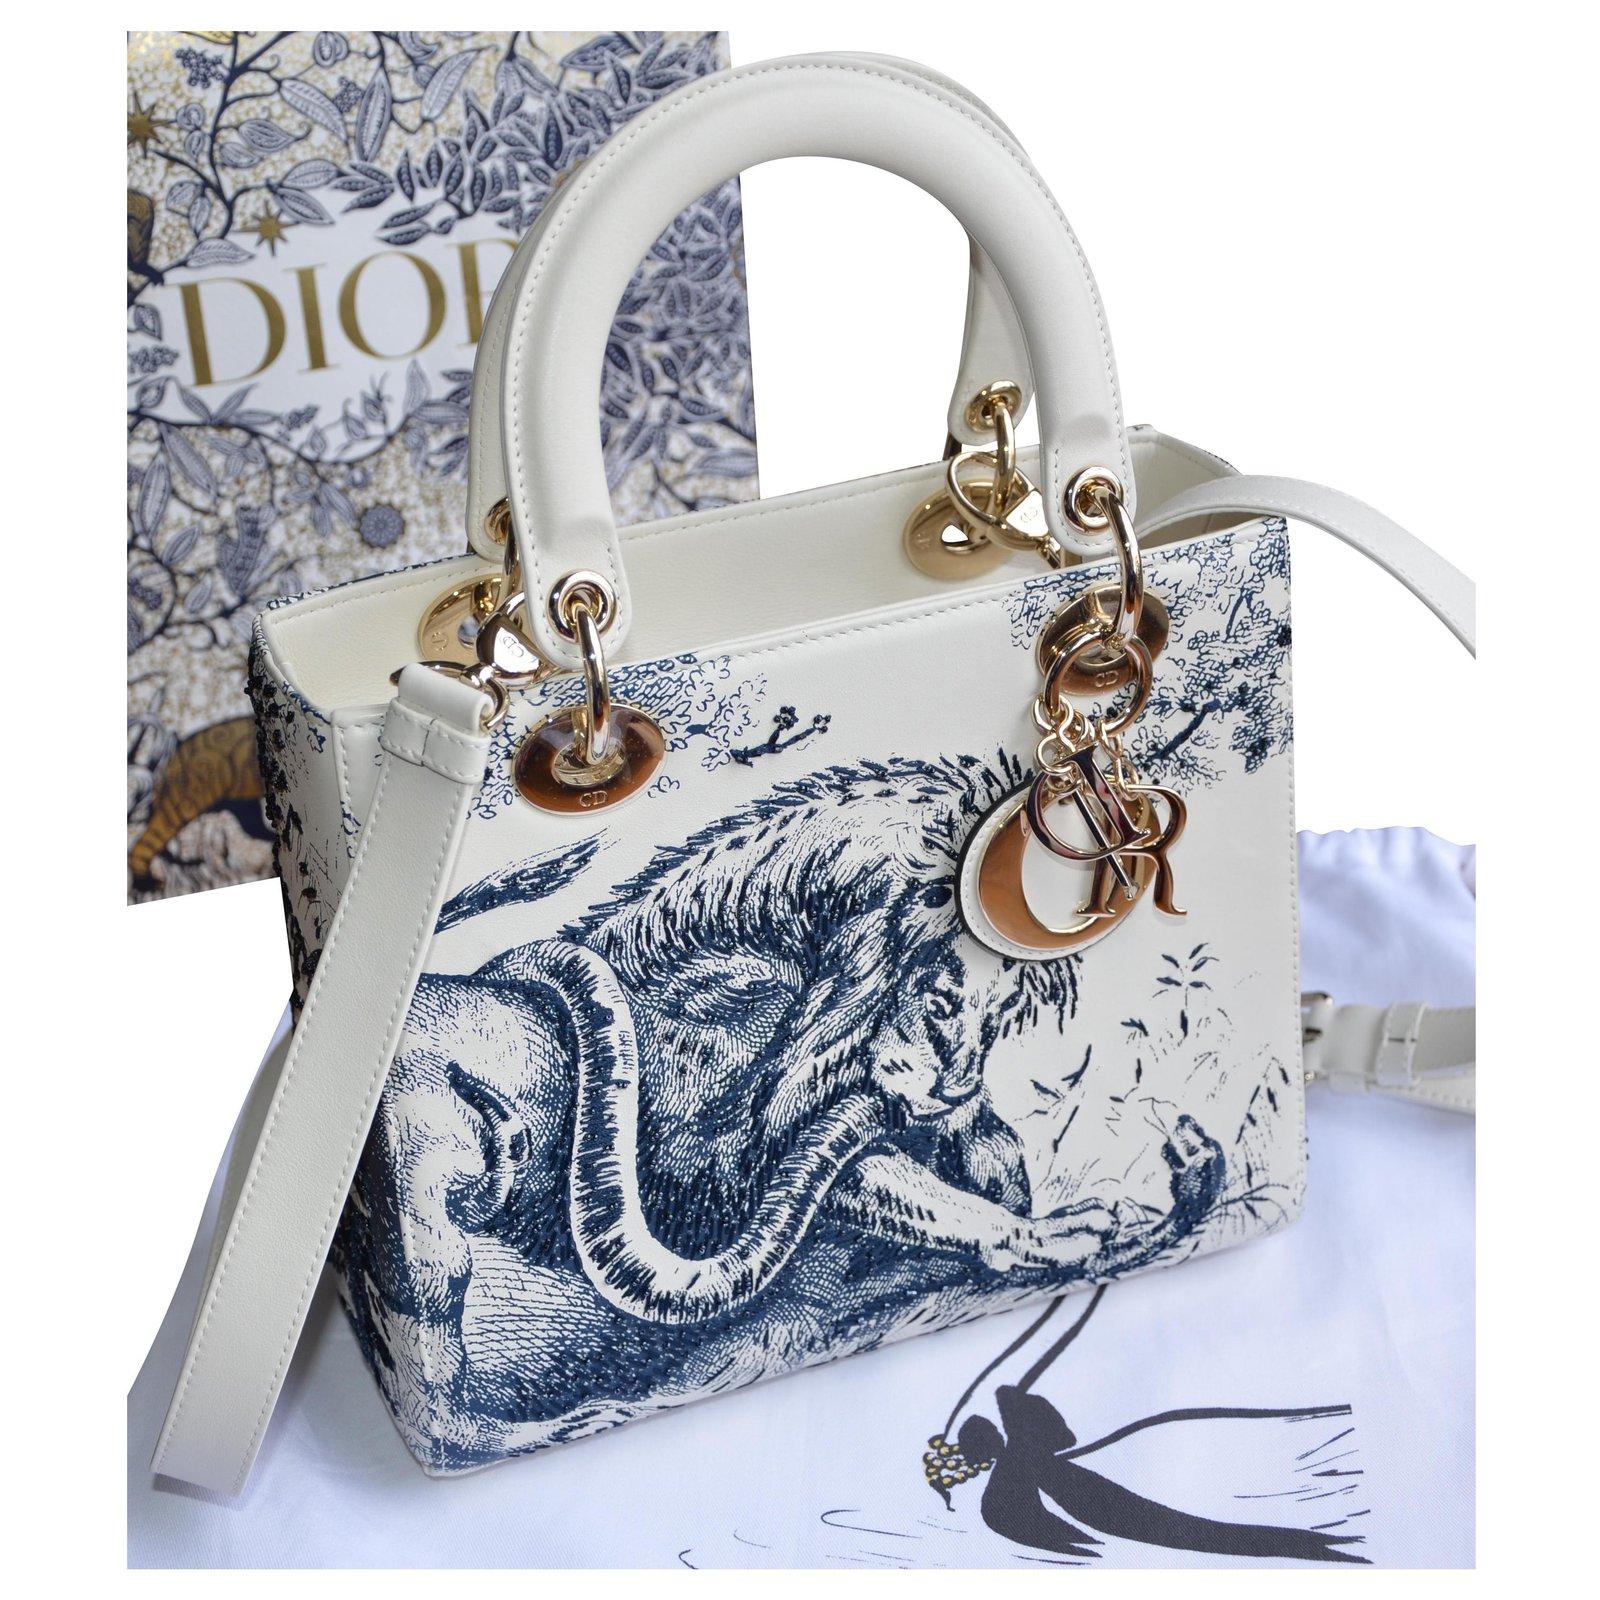 Dior Christian Dior Lady Dior bag with Toile de Jouy motif Handbags Leather  White,Golden,Eggshell,Dark blue ref.225262 - Joli Closet